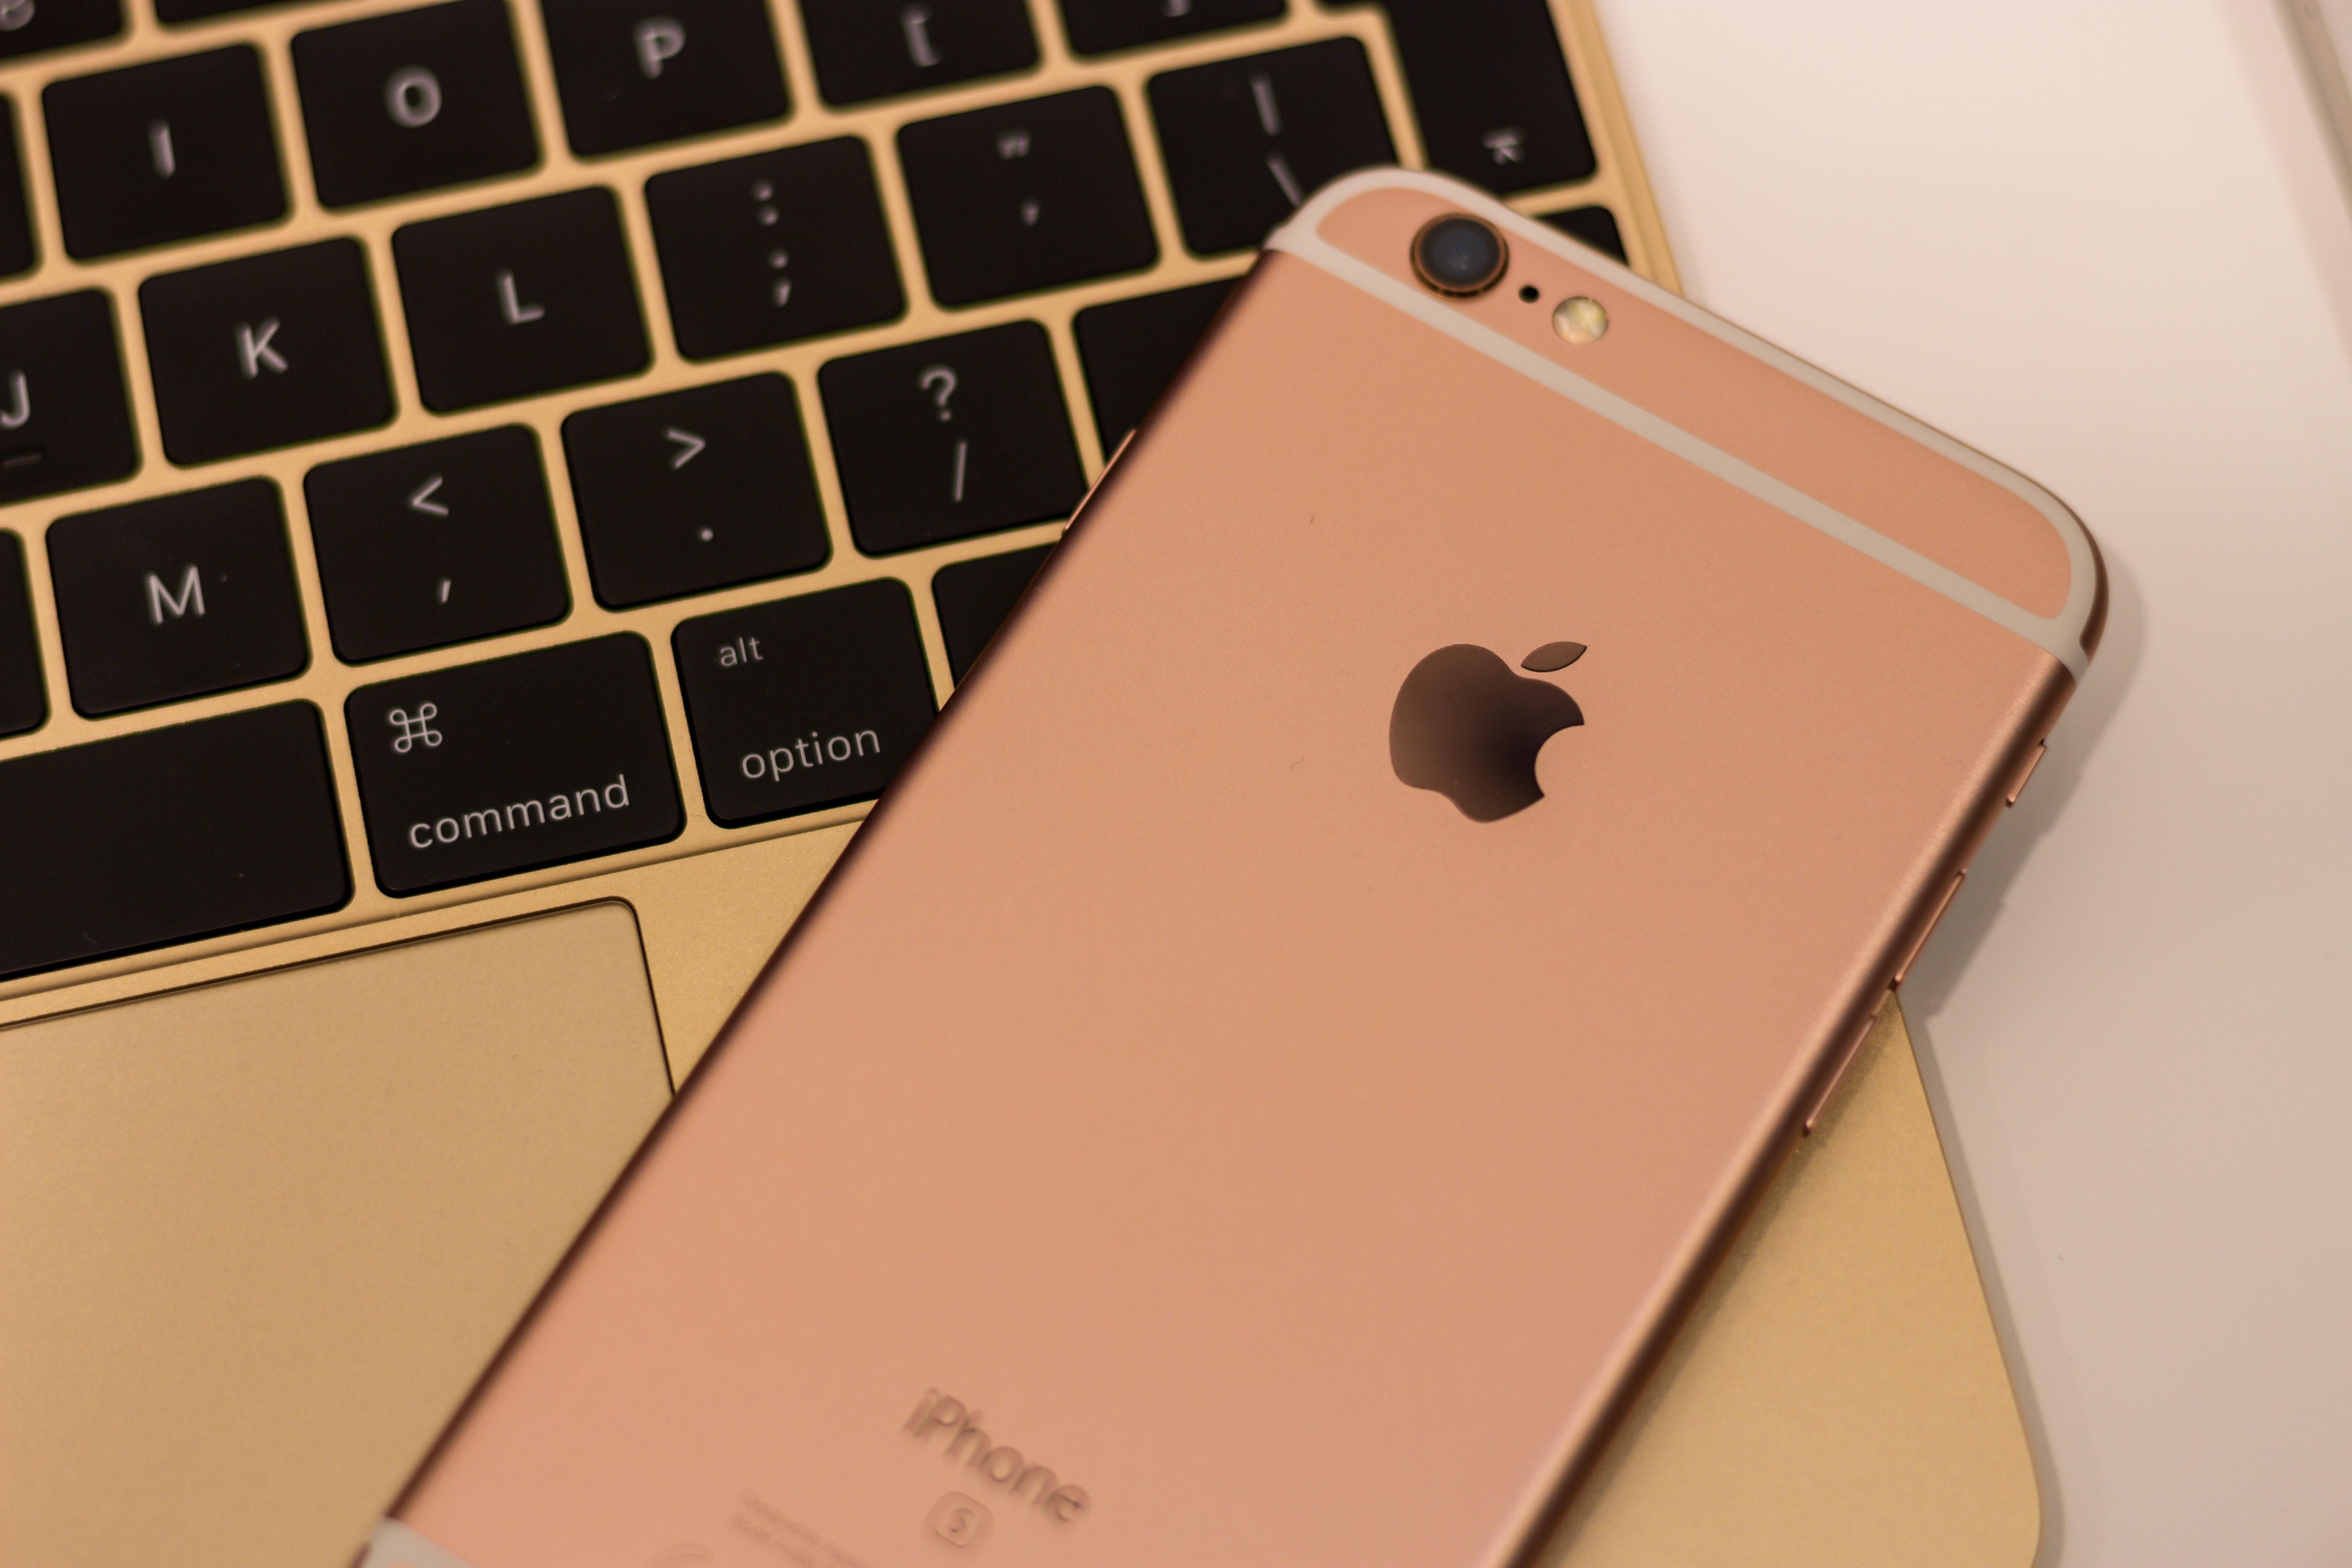 apple-apple-devices-blur-cellphone-198192